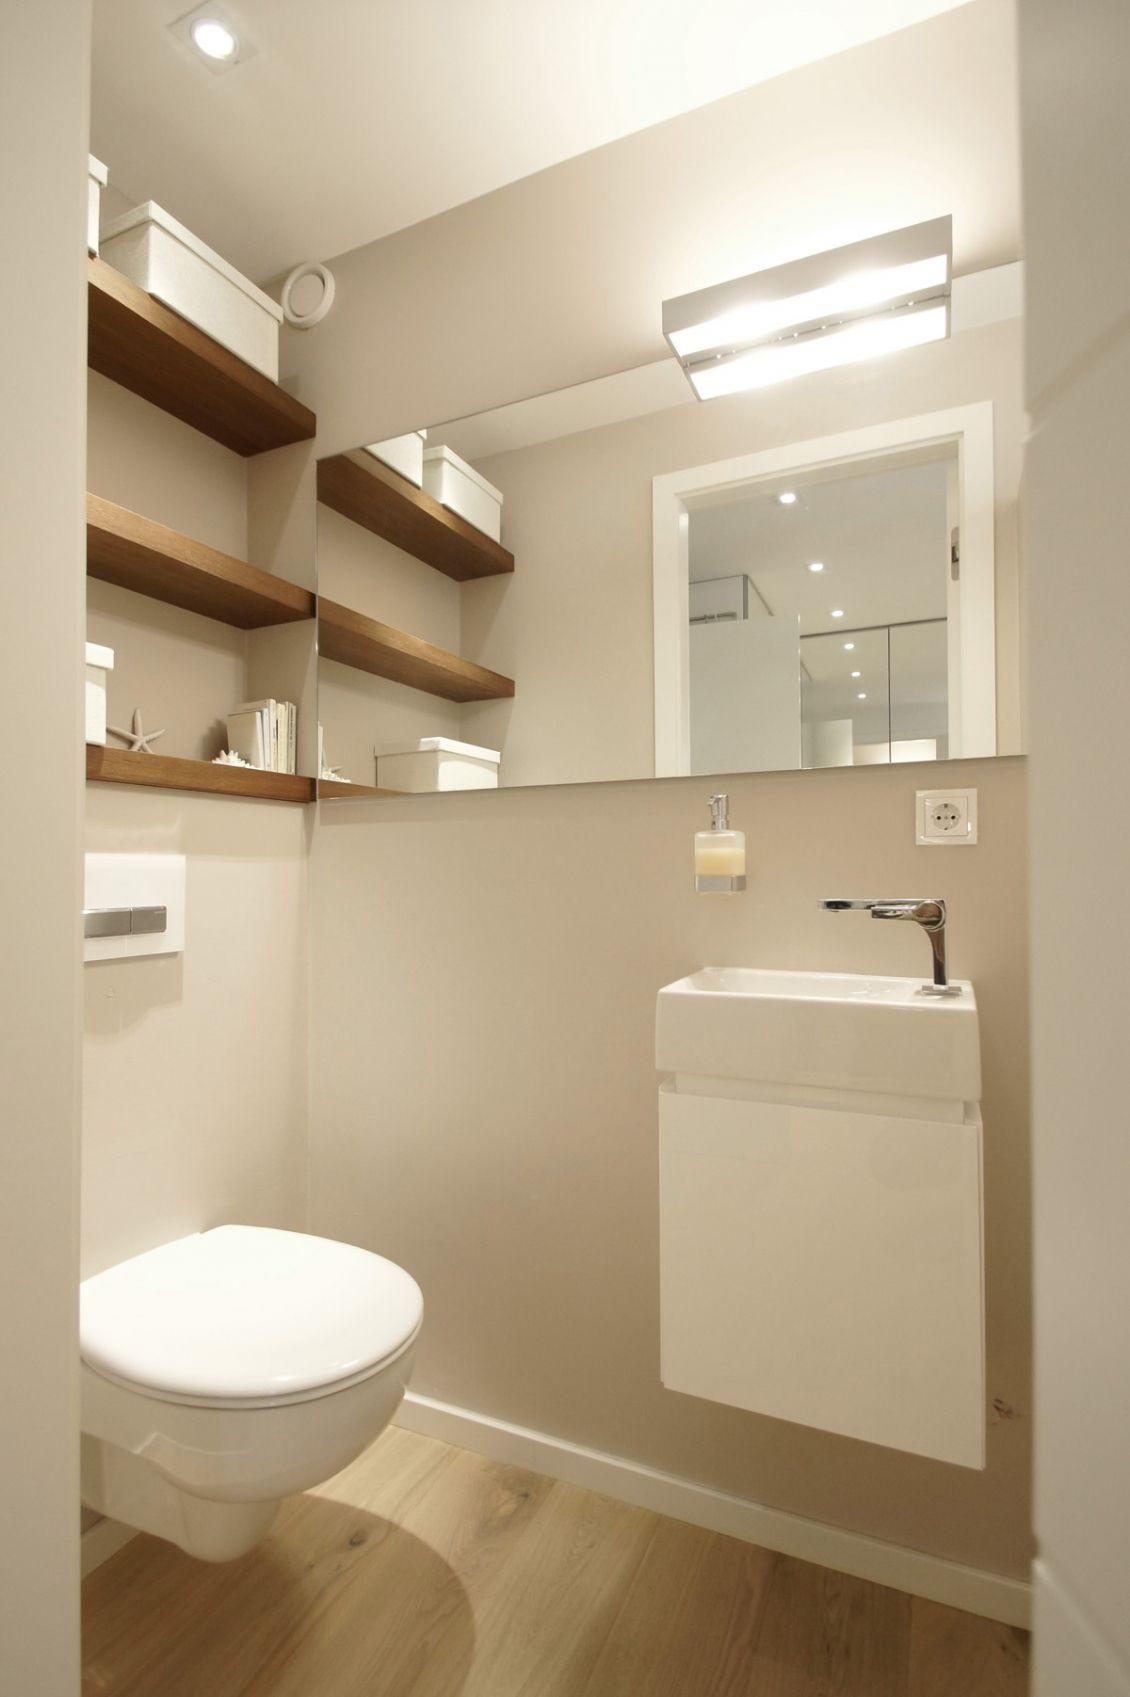 verbouwing appartement | innsides | bathroom | pinterest | holzboden